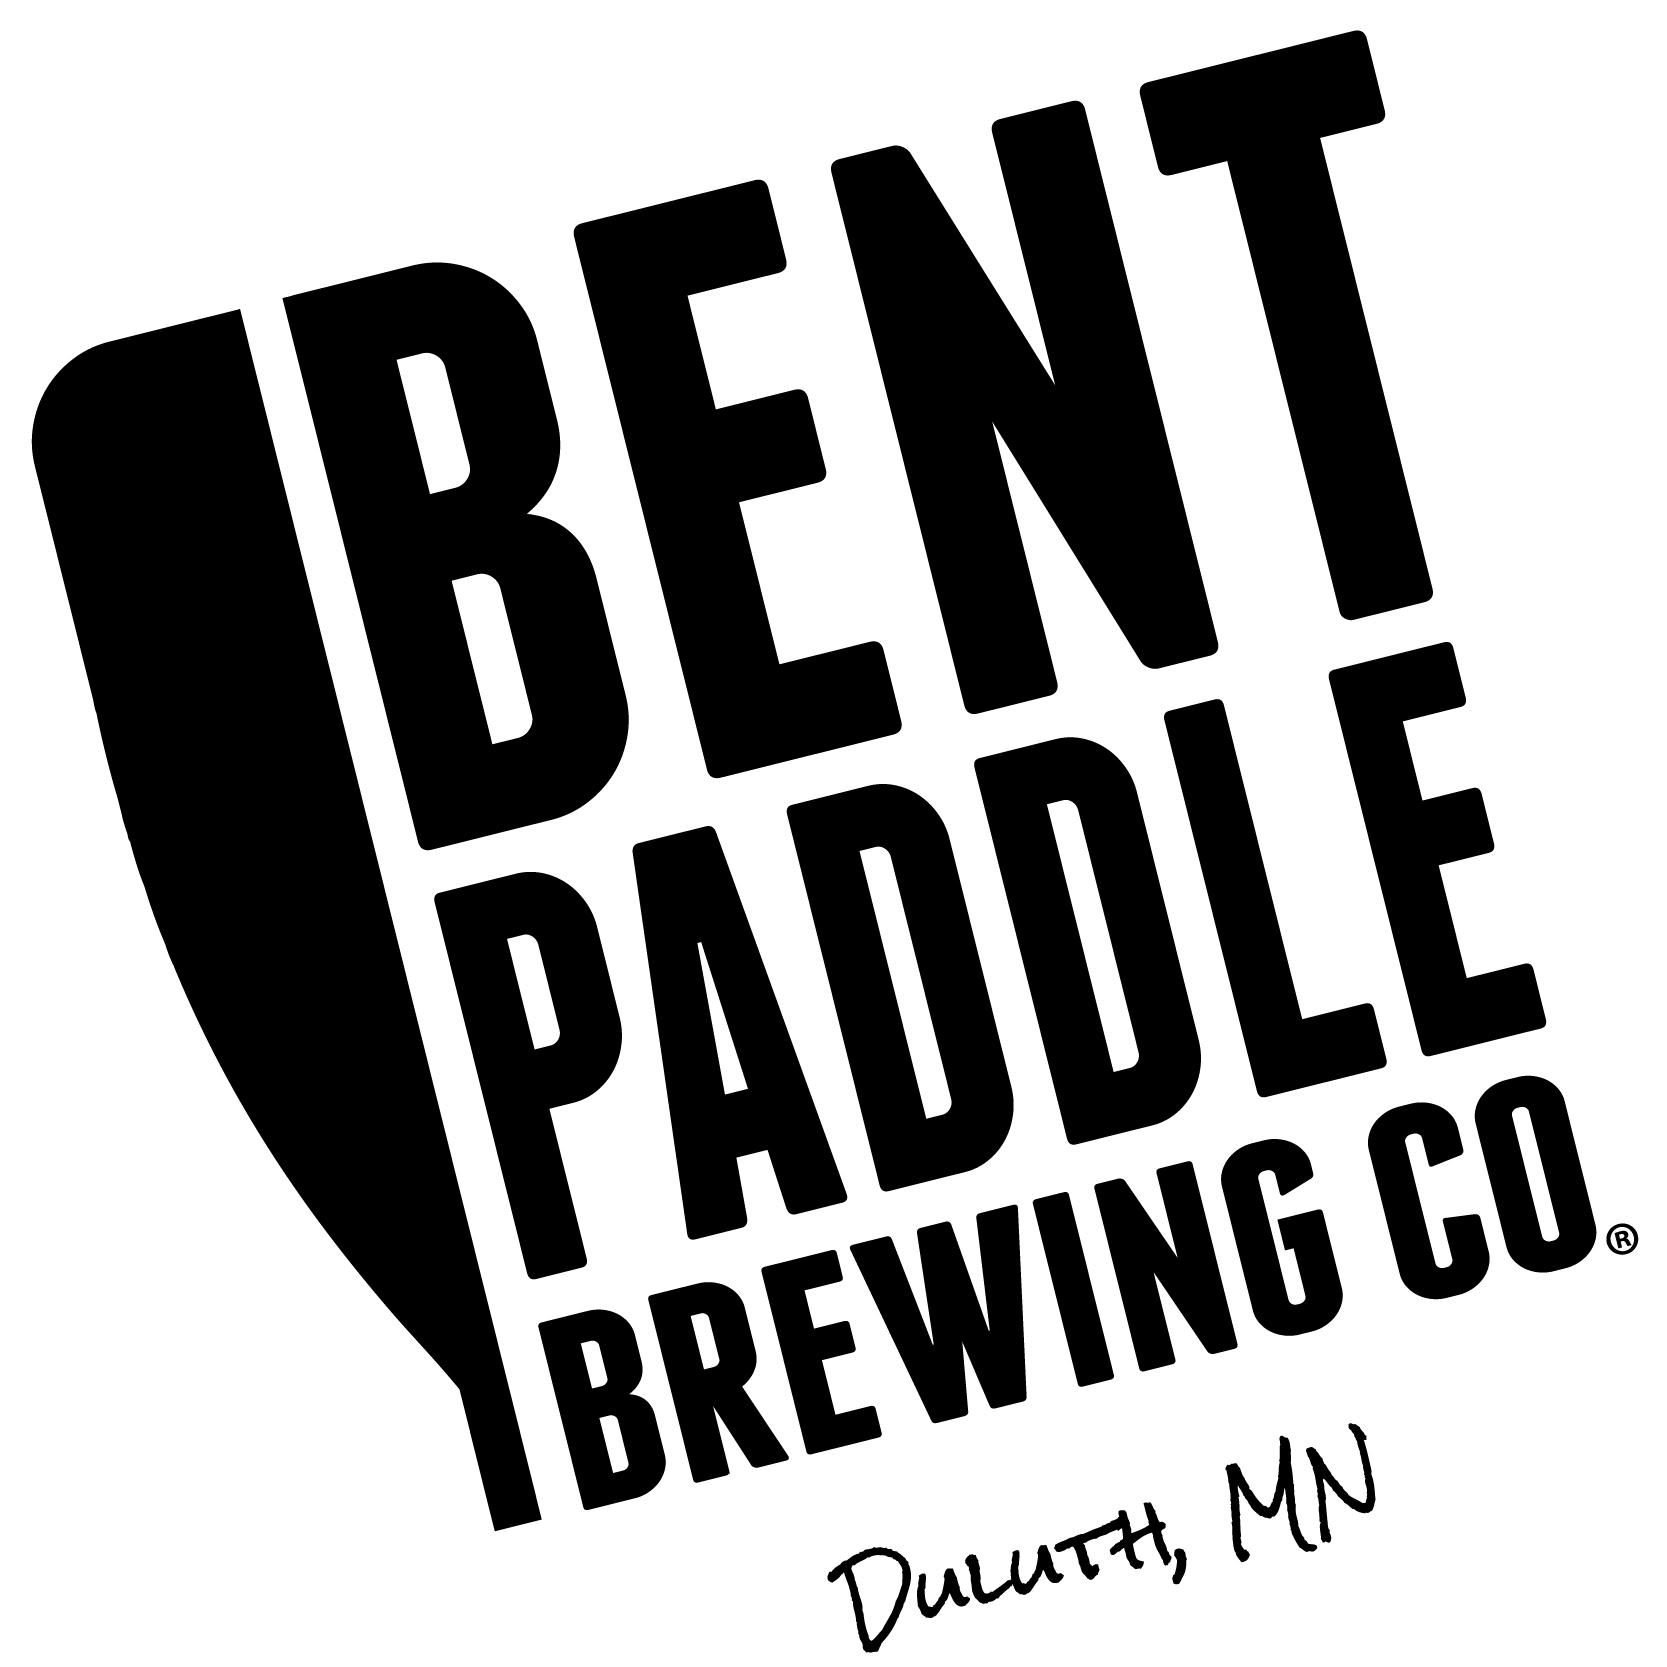 Bent Paddle